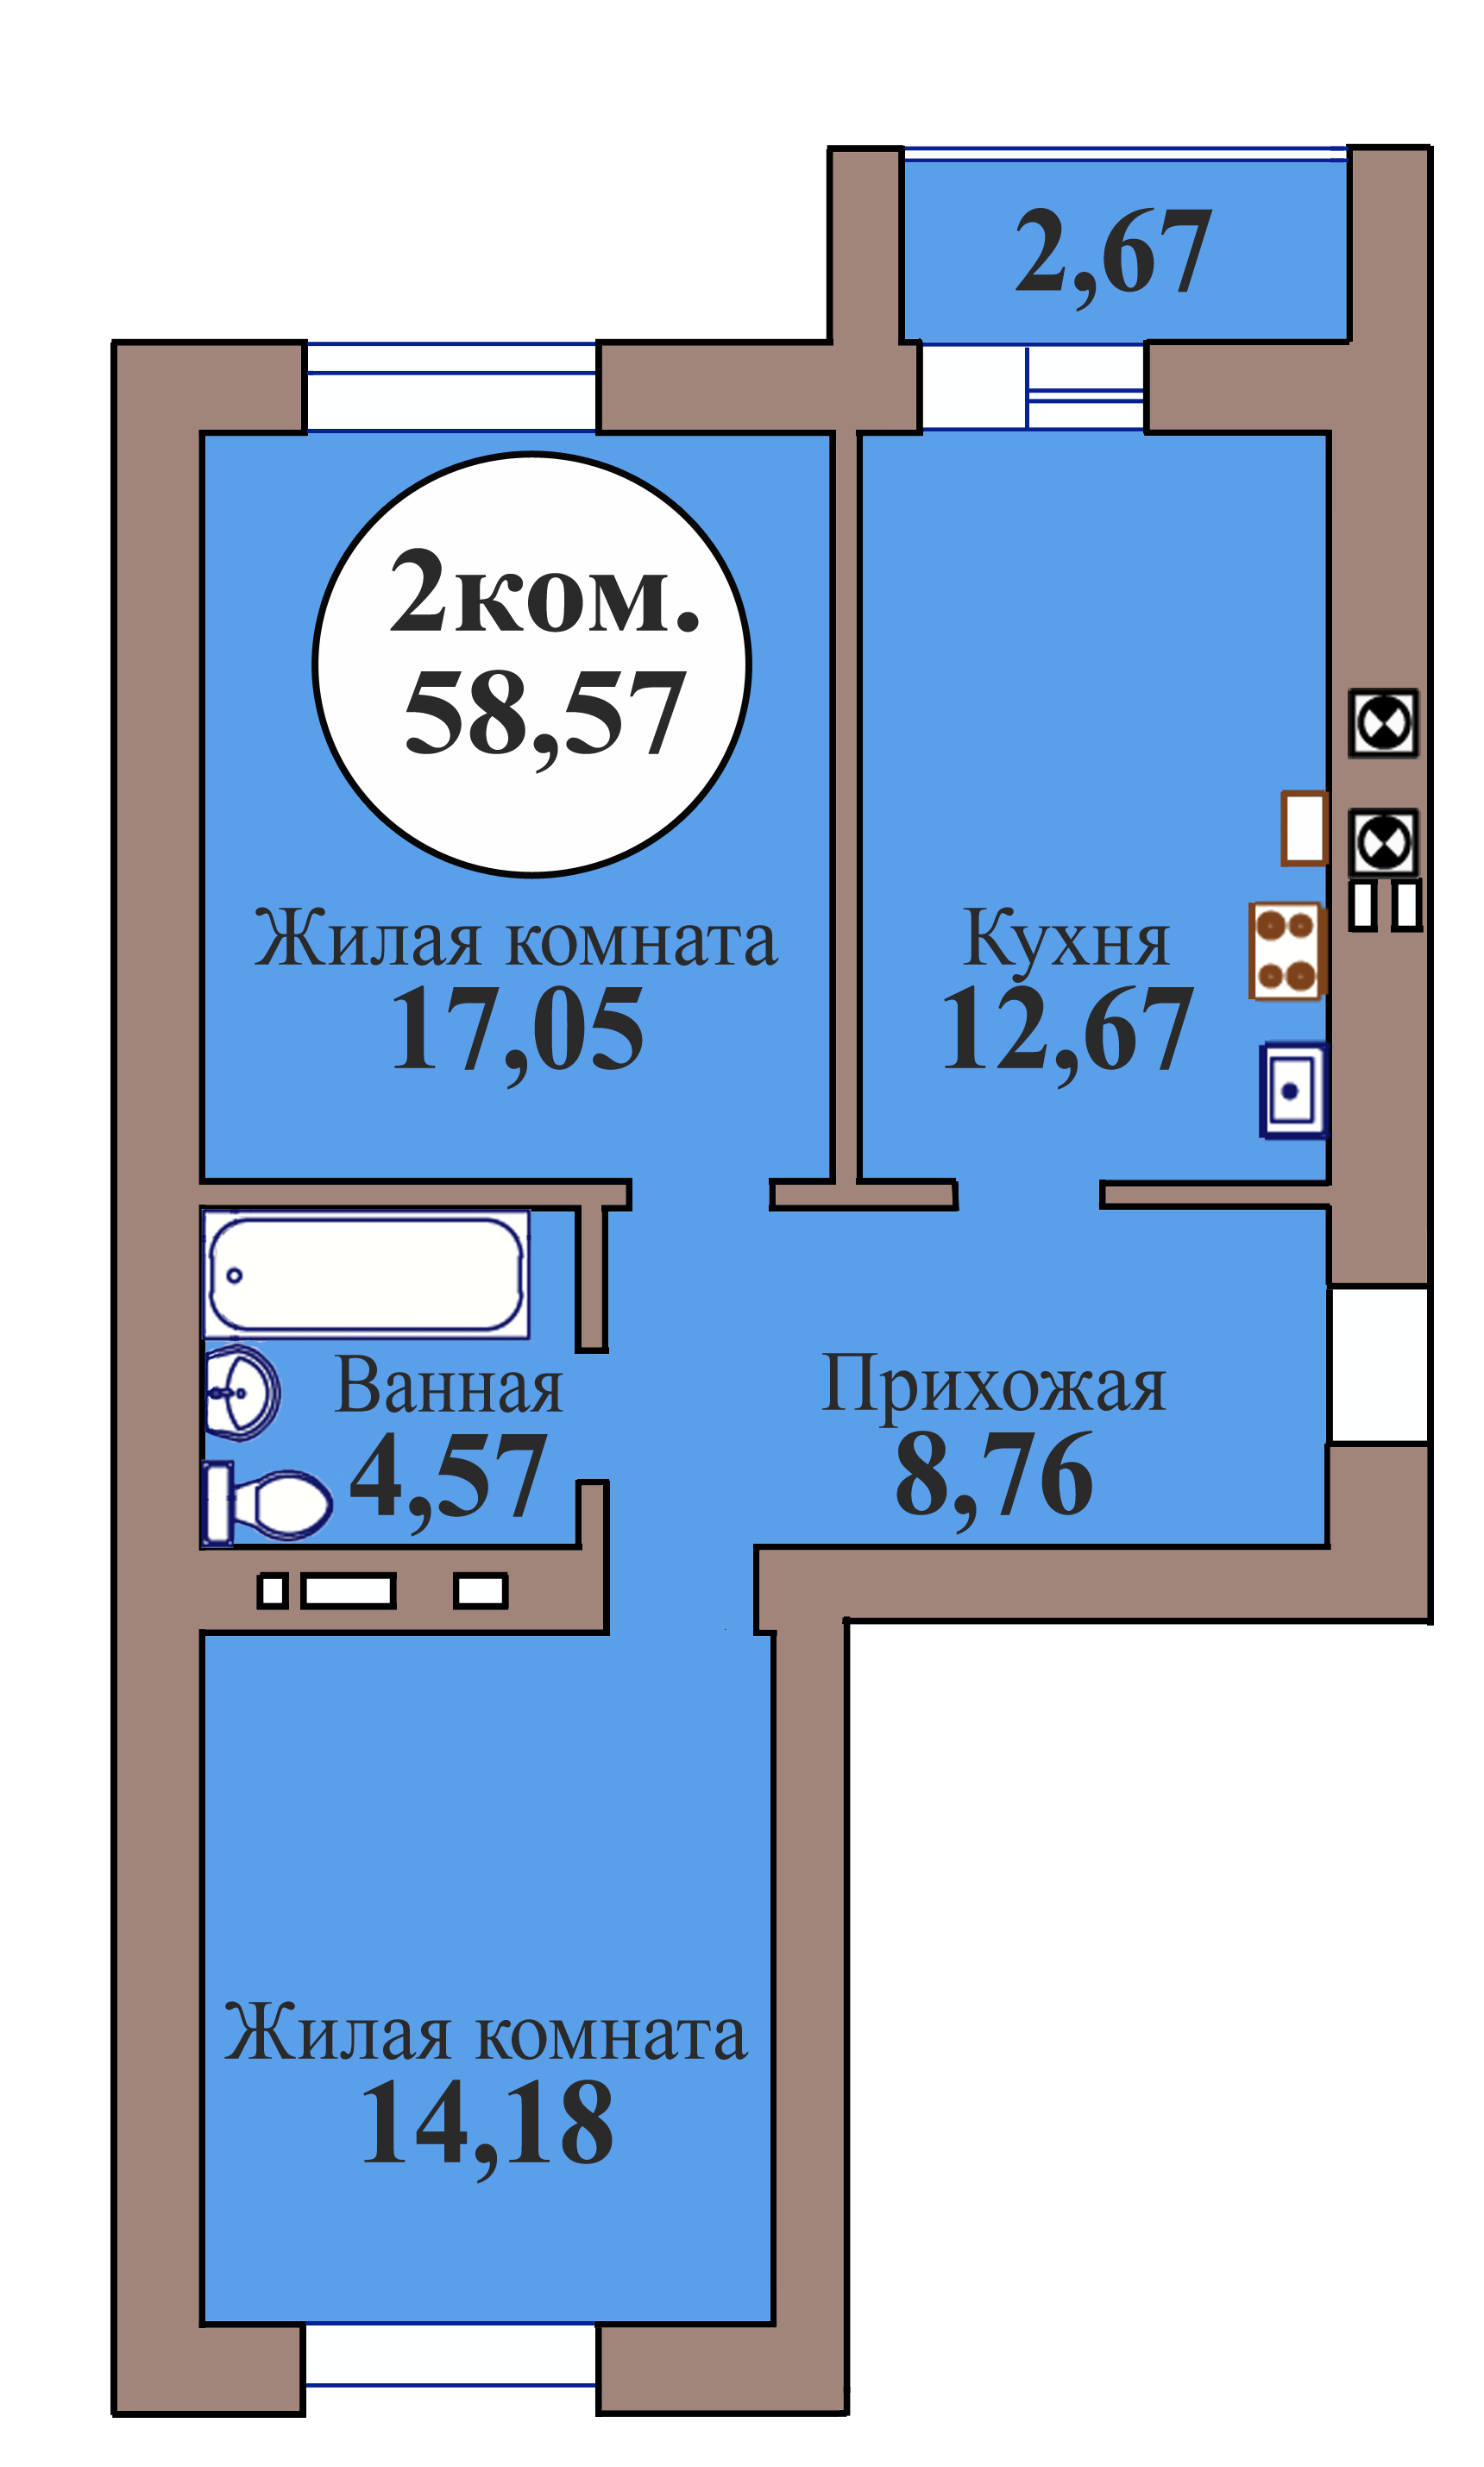 2-комн. кв. по ГП дом №3, МКР Васильково, кв. 133 в Калининграде